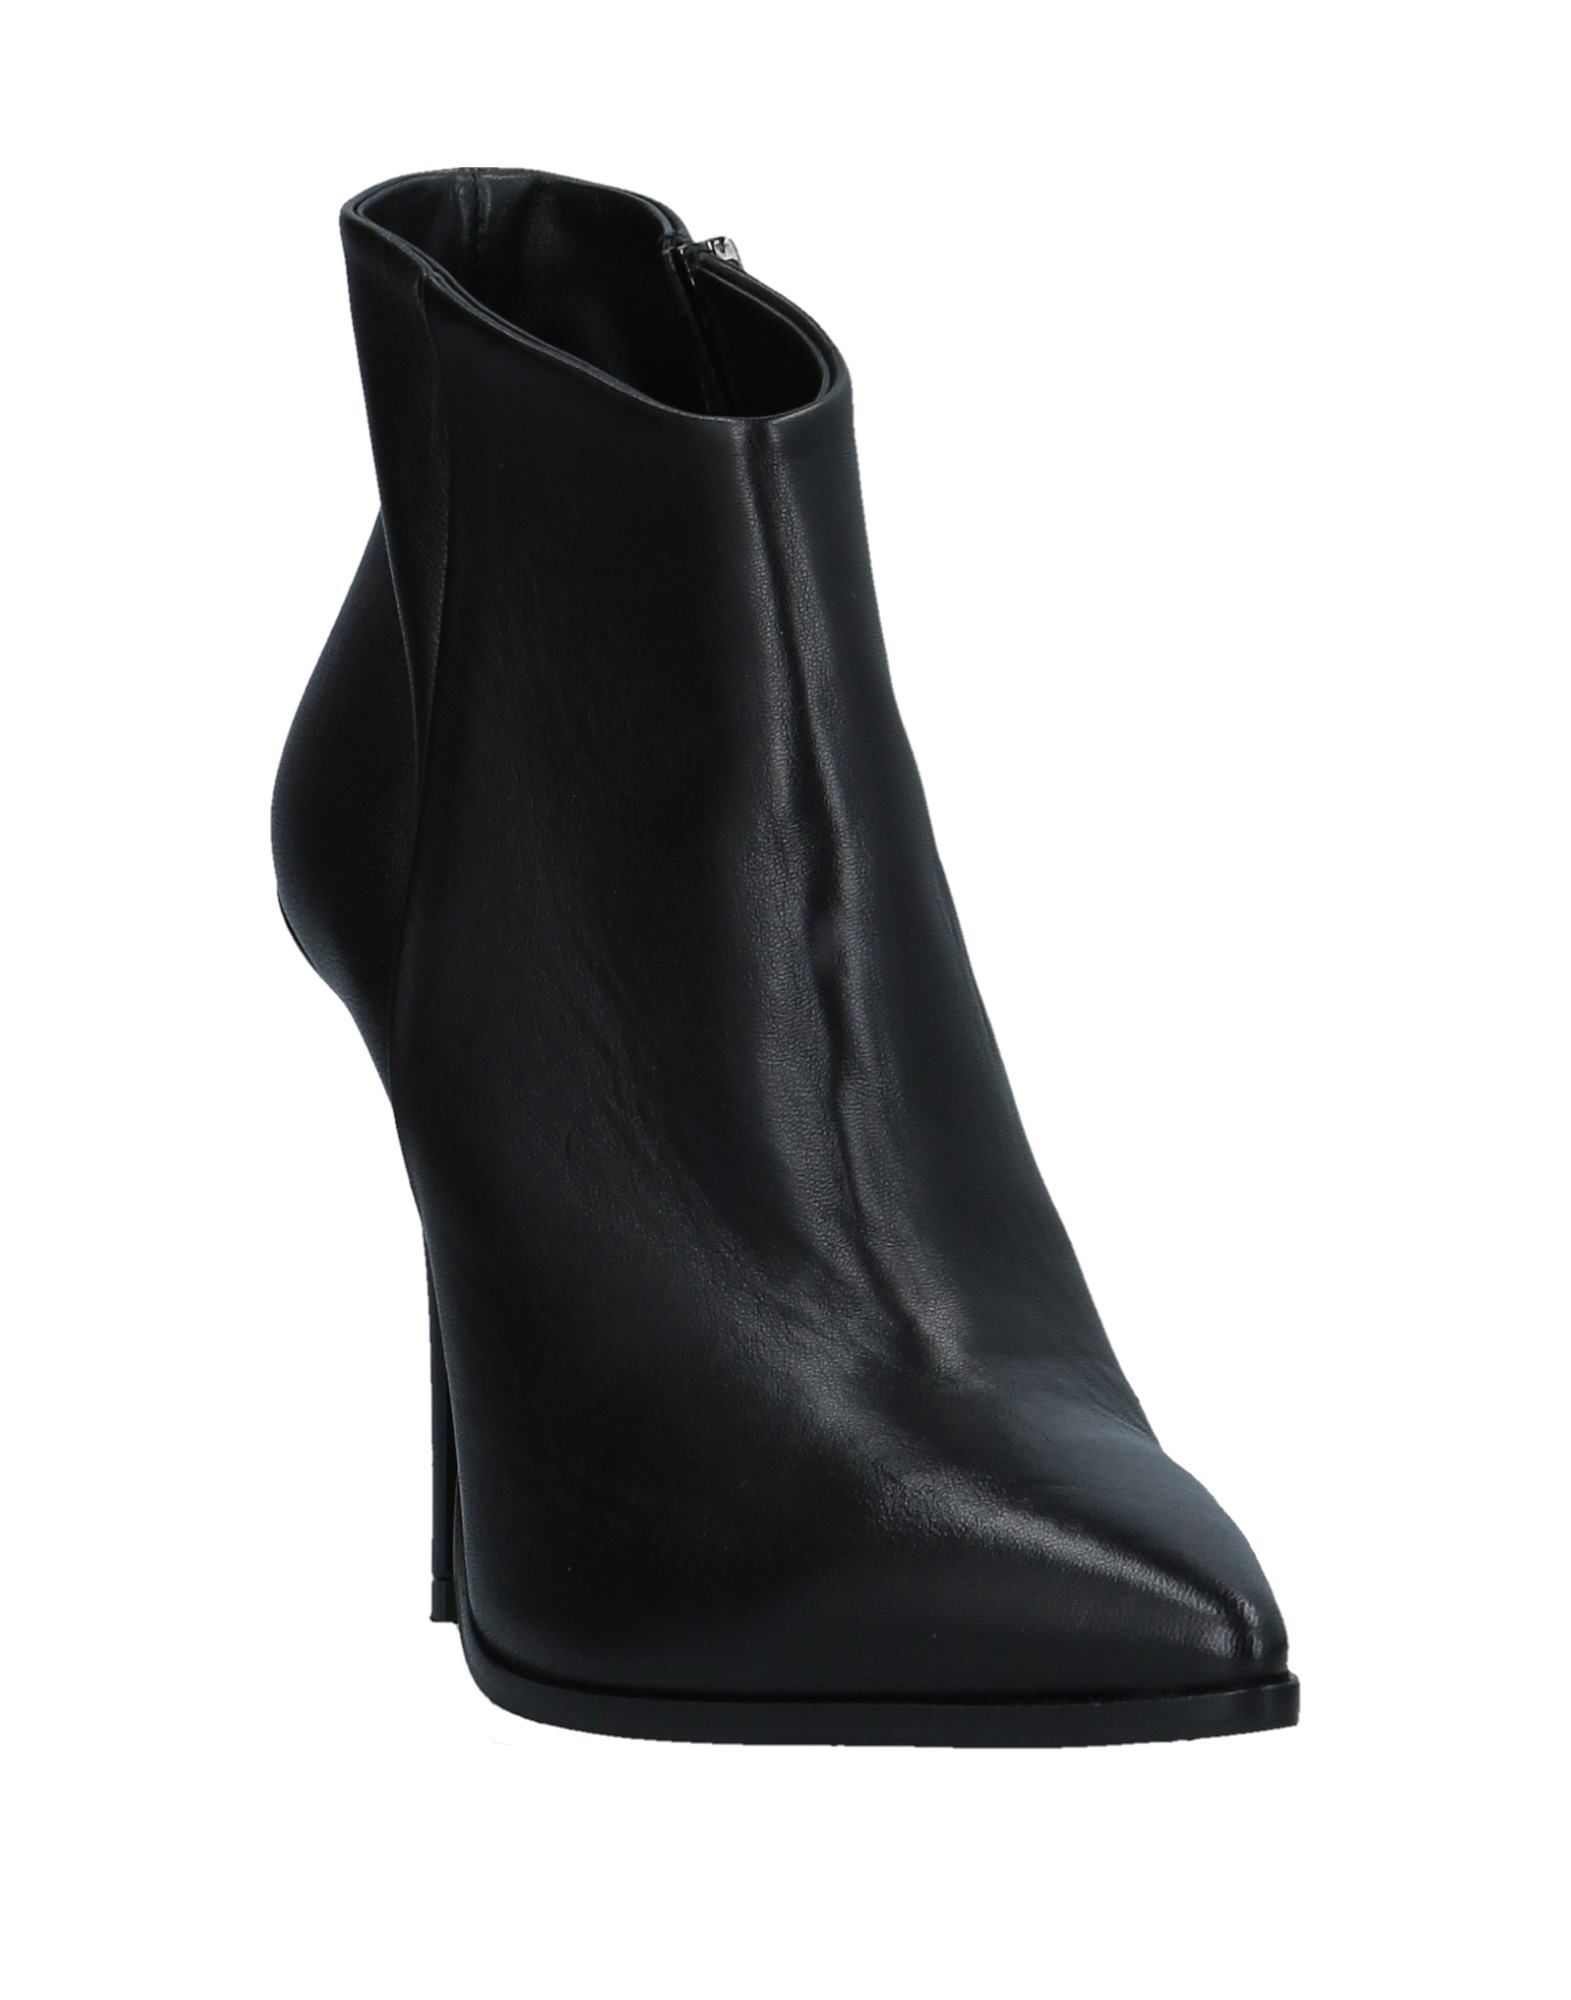 Rabatt Schuhe Fabi Stiefelette  Damen  Stiefelette 11531077LG 544a78